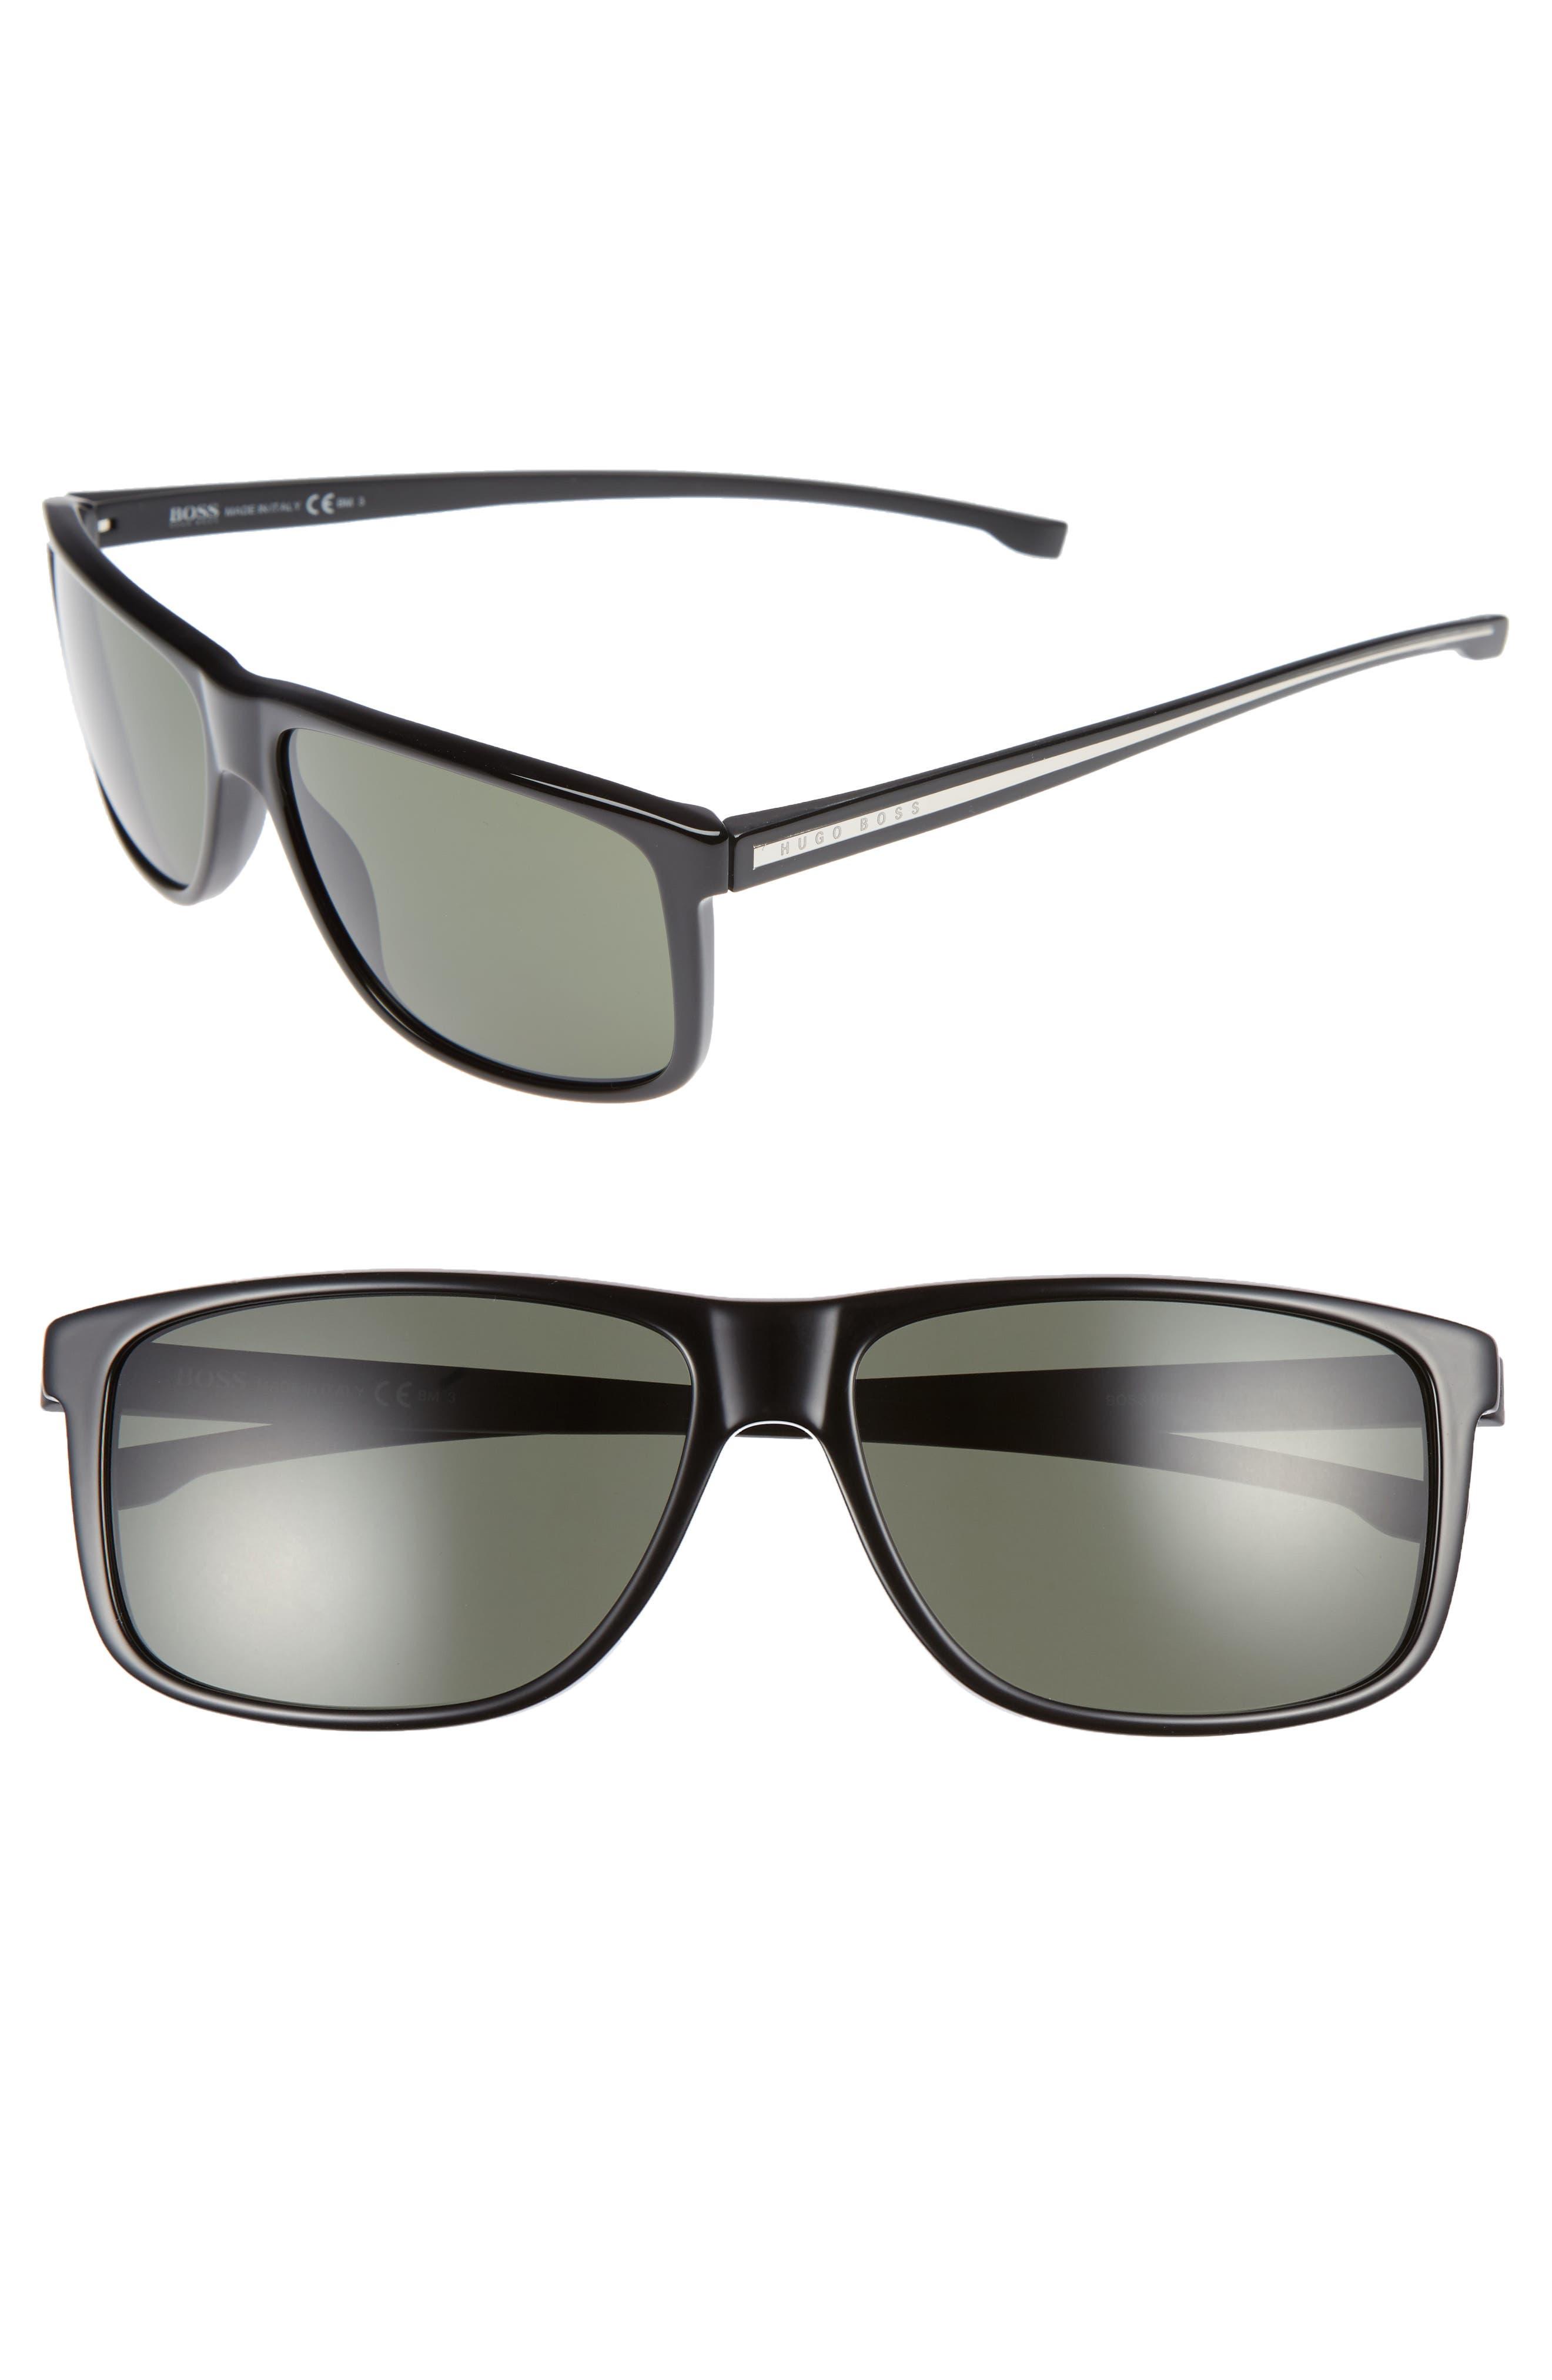 60mm Sunglasses,                         Main,                         color, BLACK/ GREY GREEN